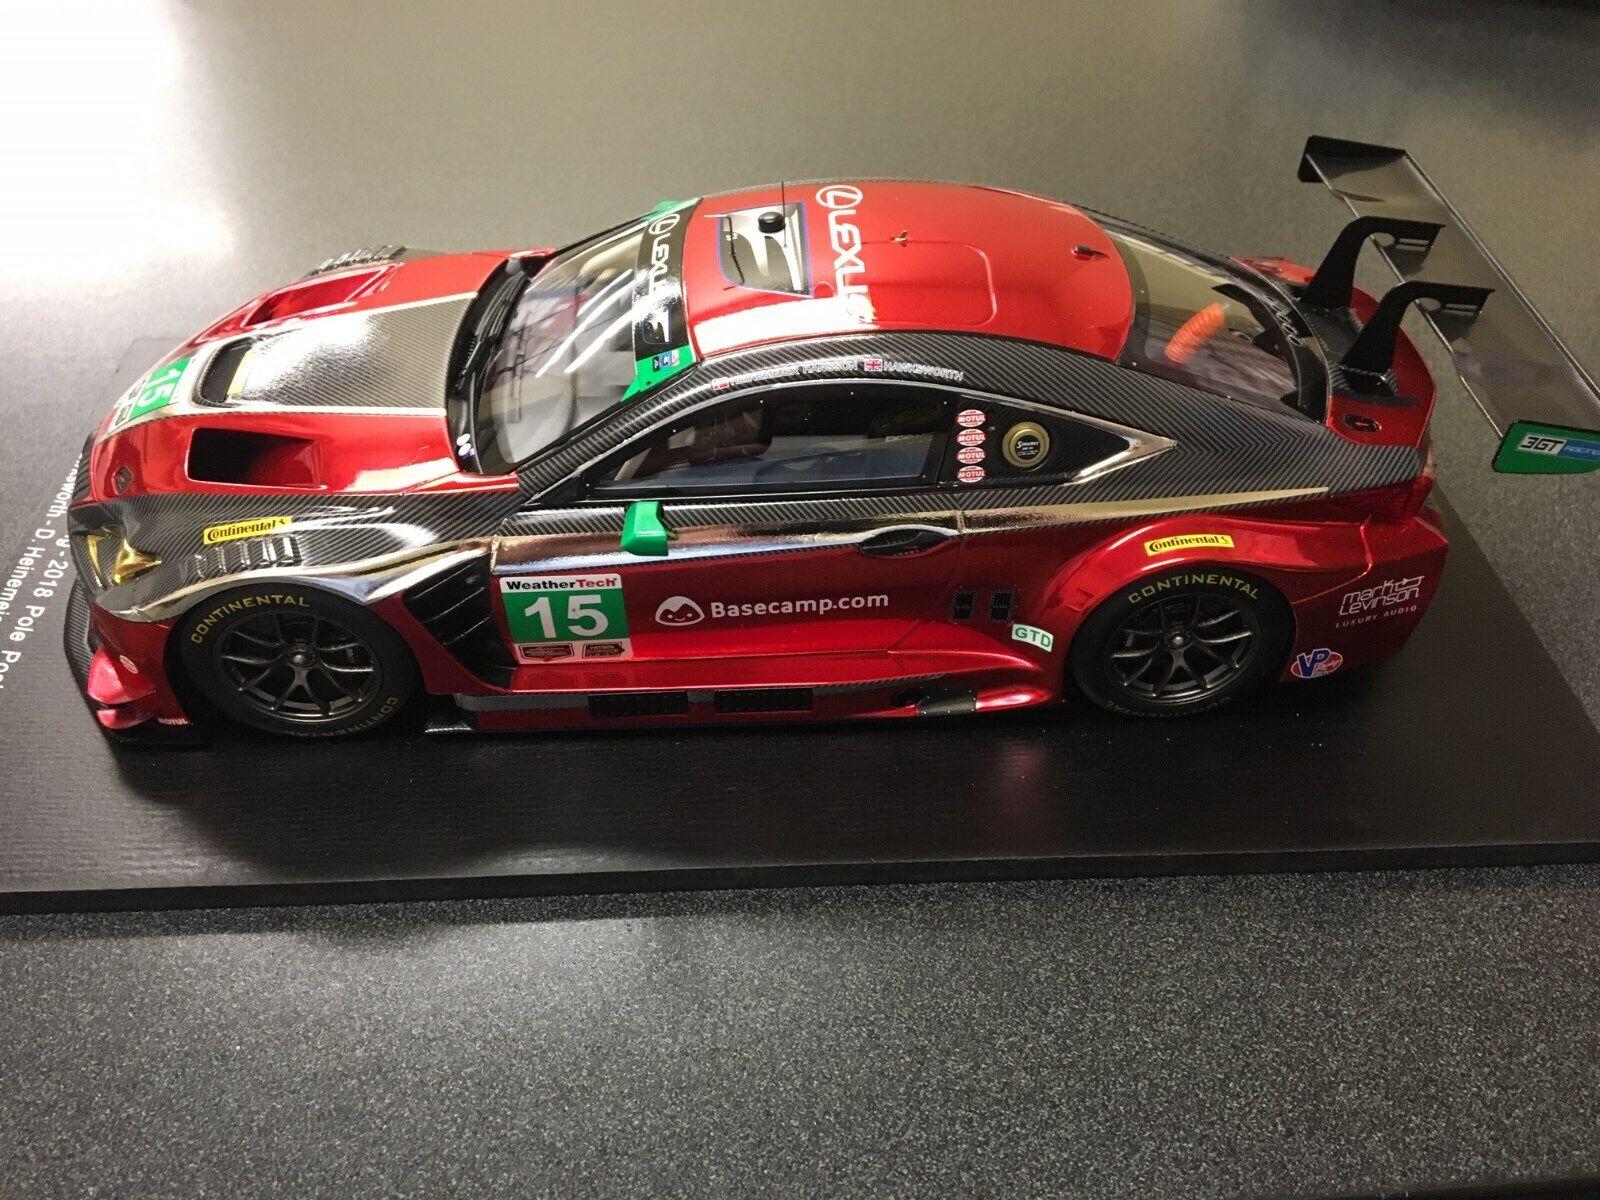 Spark 2018 Lexus tävlings RCF GT3 1  18 skala röd Ny RARE -bil